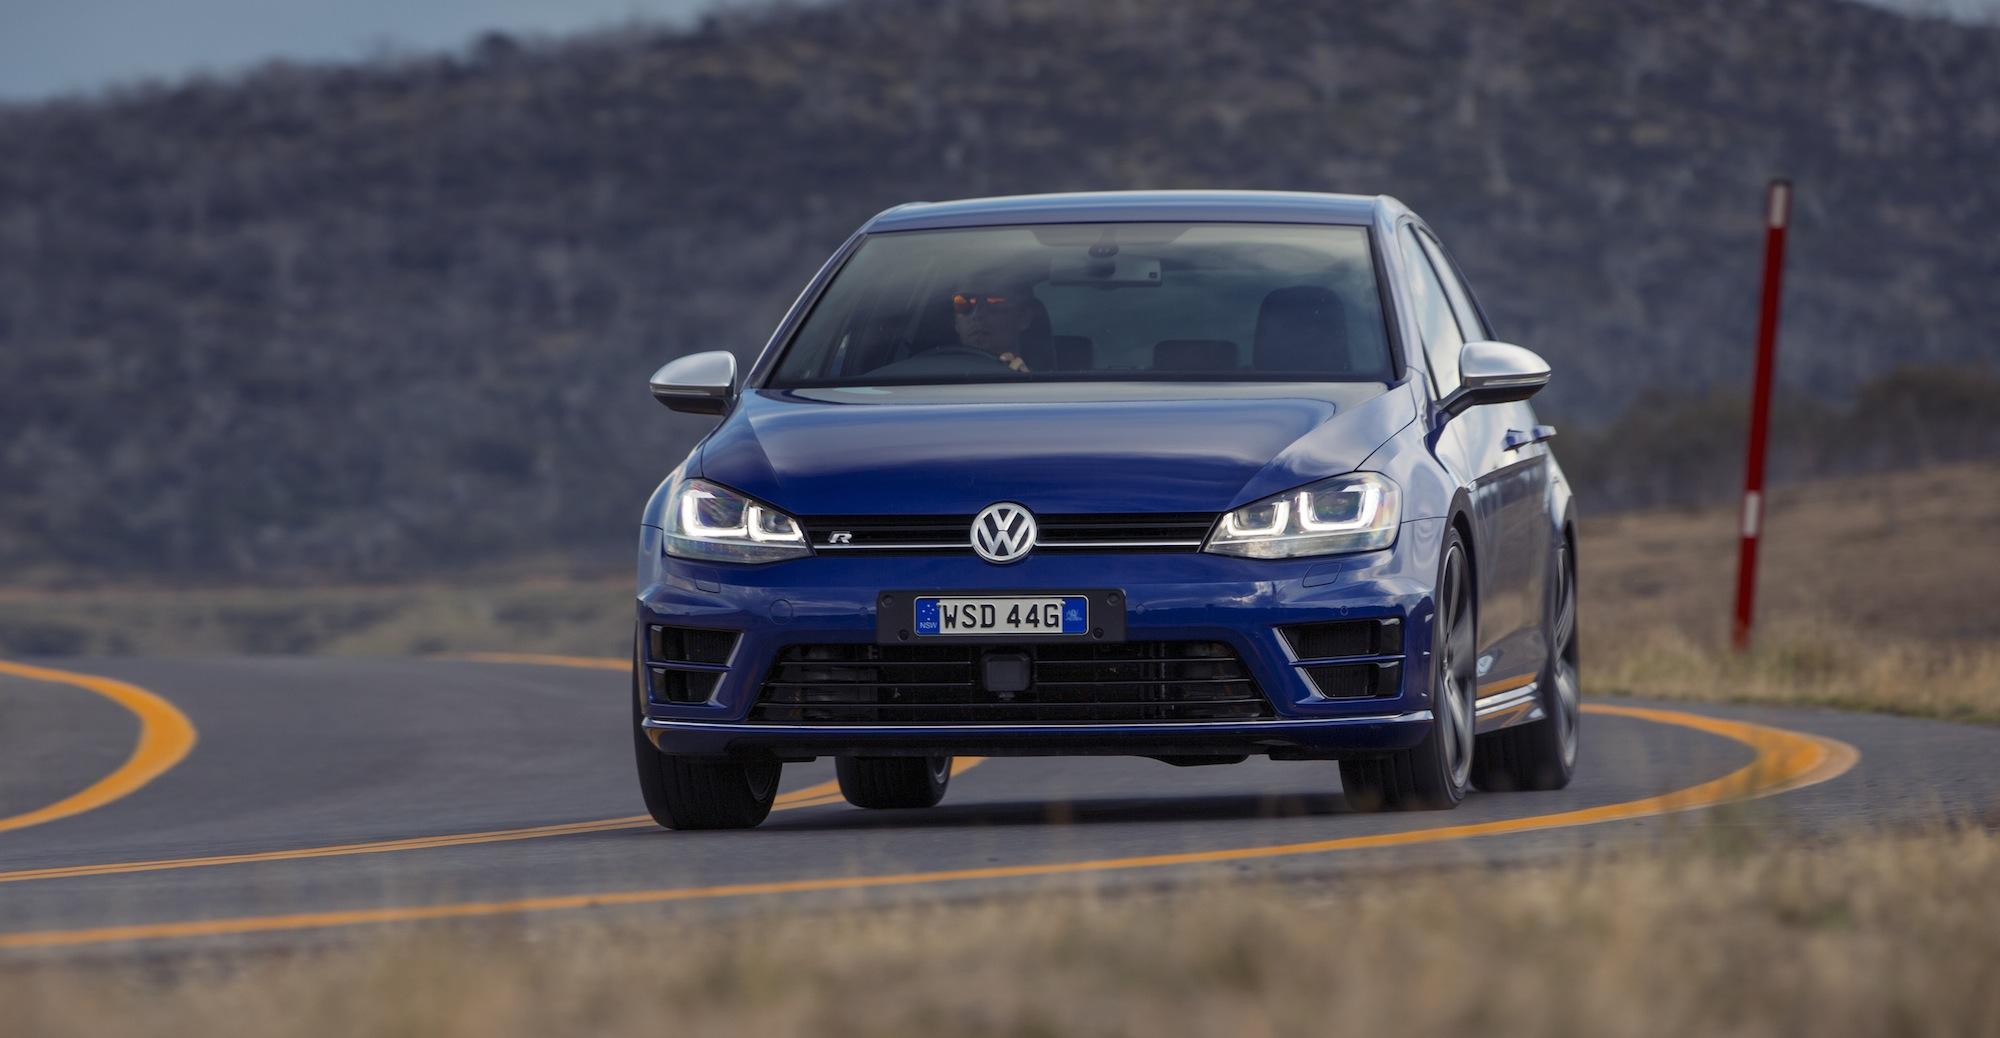 2014 Volkswagen Golf R Review Photos Caradvice